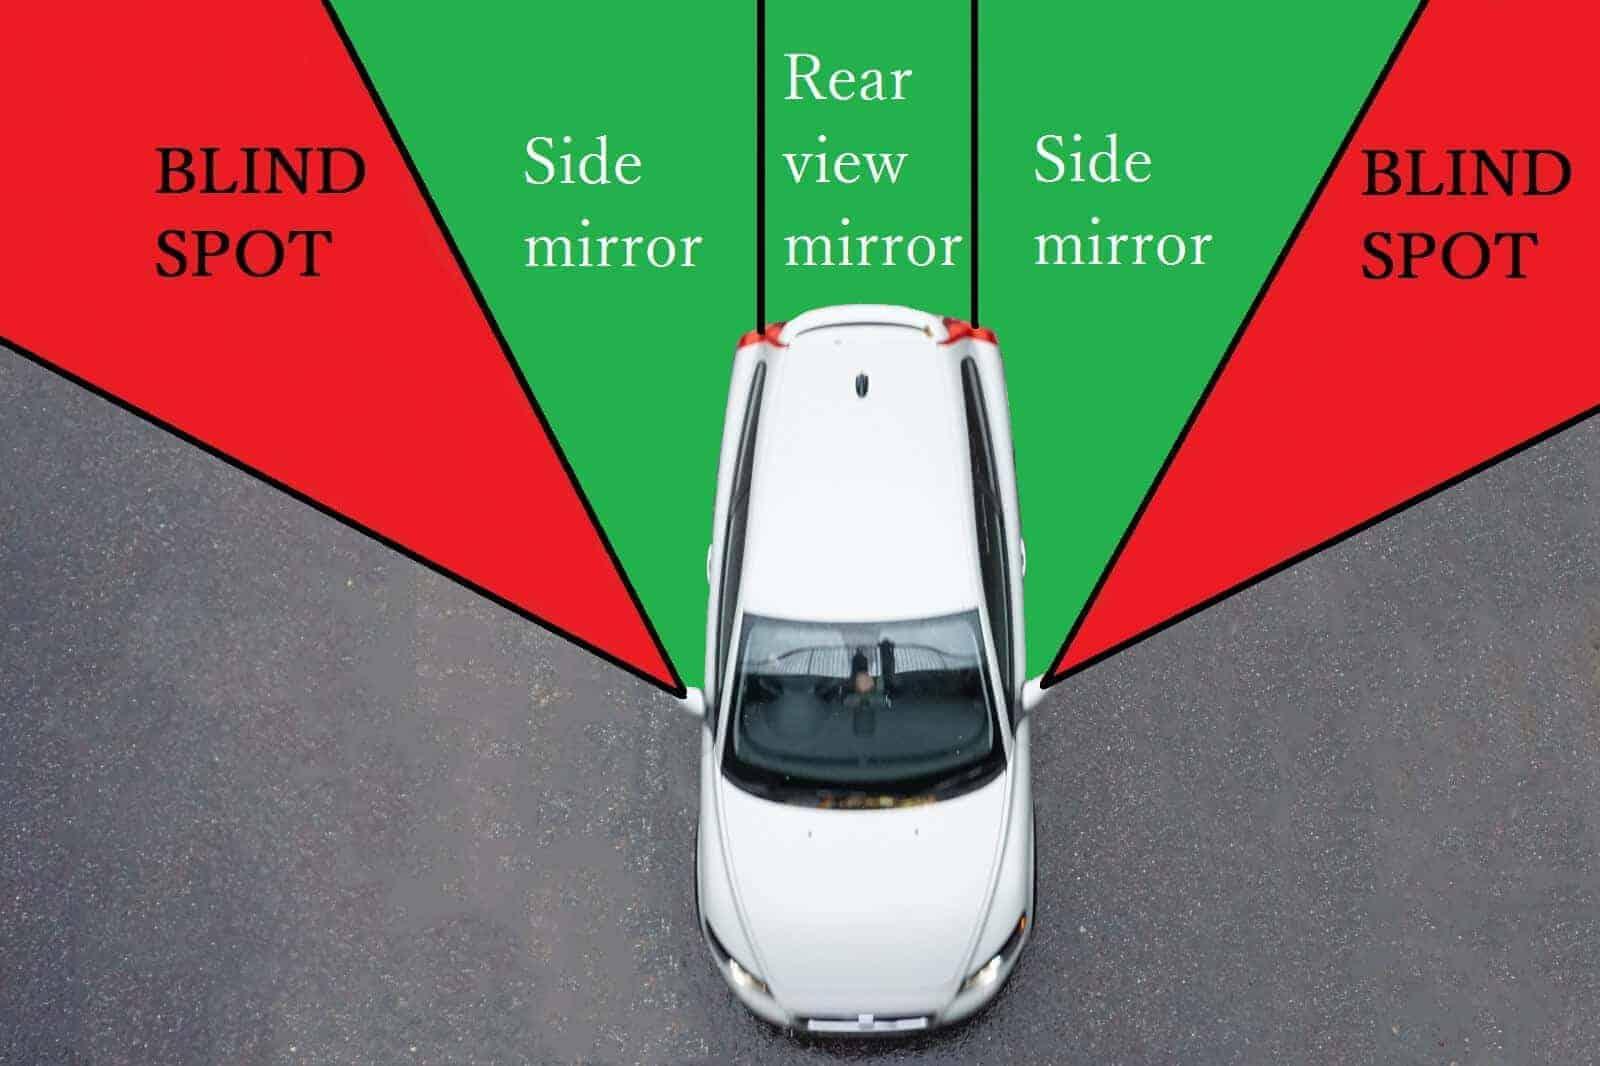 Vehicle blind spots to avoid